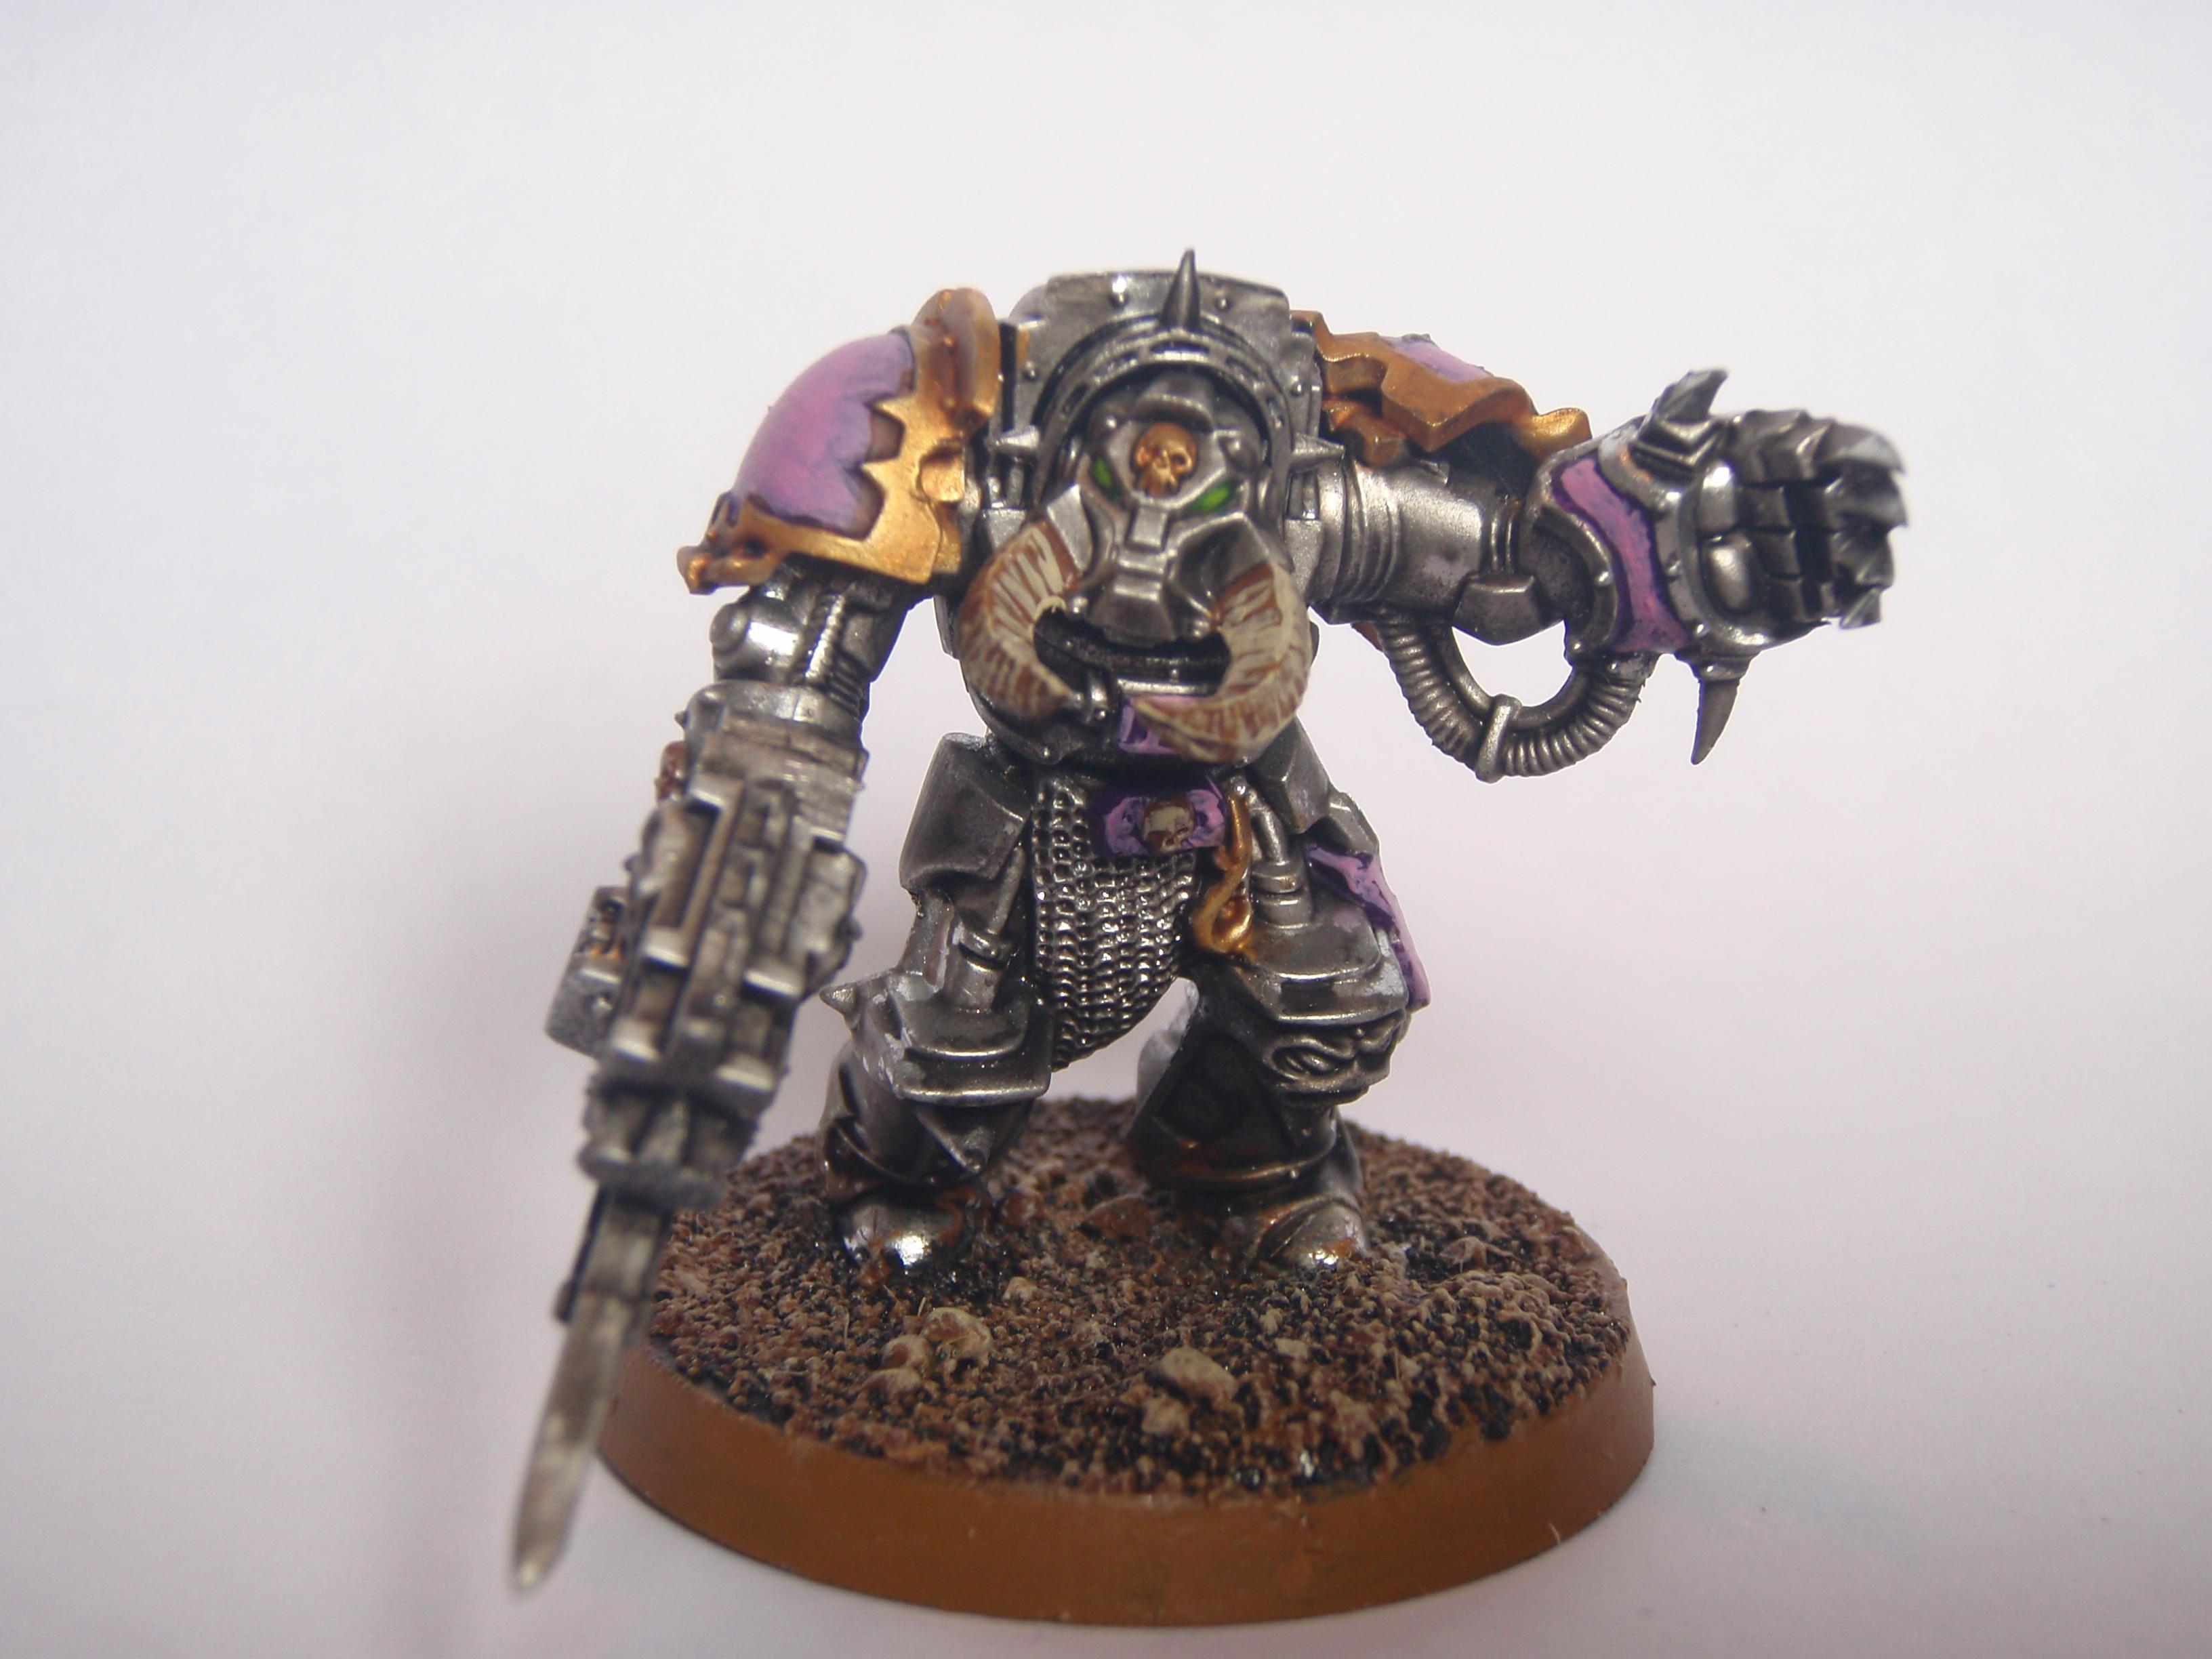 Chaos Space Marines, Emperor's Children, Terminator Armor, Warhammer 40,000